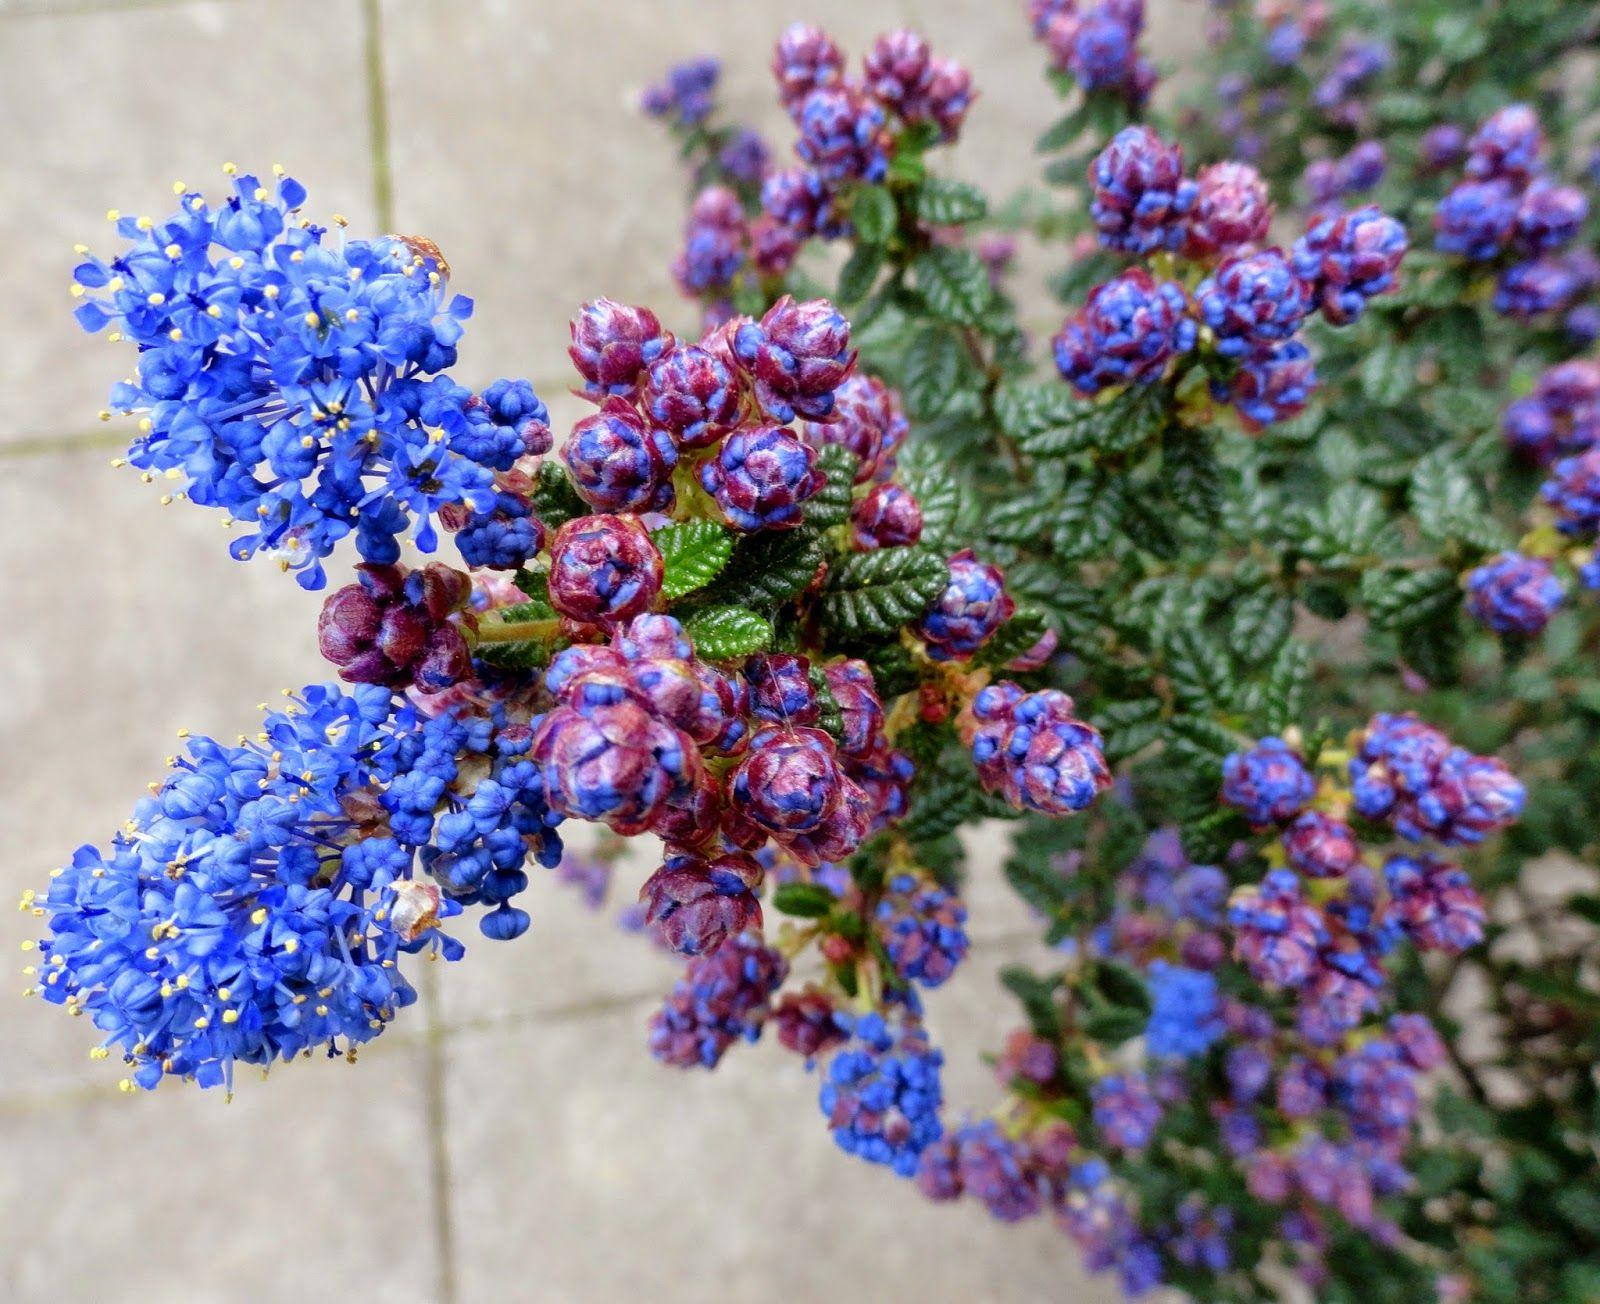 Ceanothus 'Dark Star', fragrant, intense deep blue flower